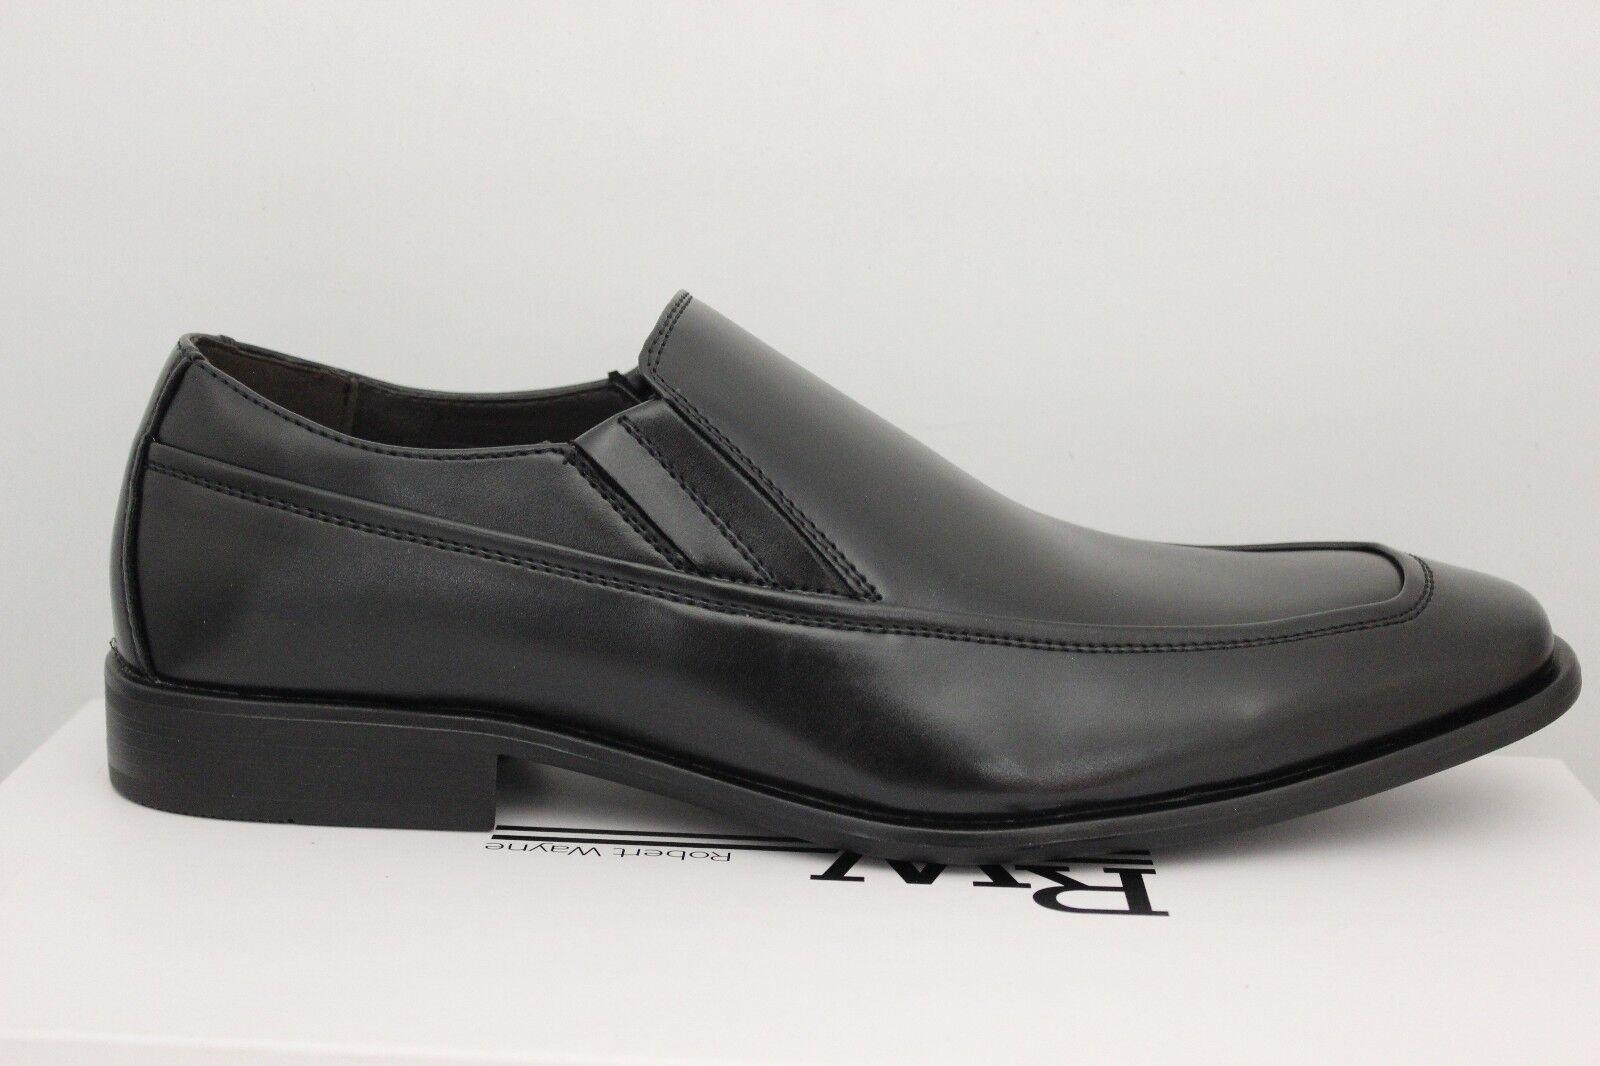 Homme Robert Wayne Frouge à Enfiler Noir Chaussures Habillées Frouge-001